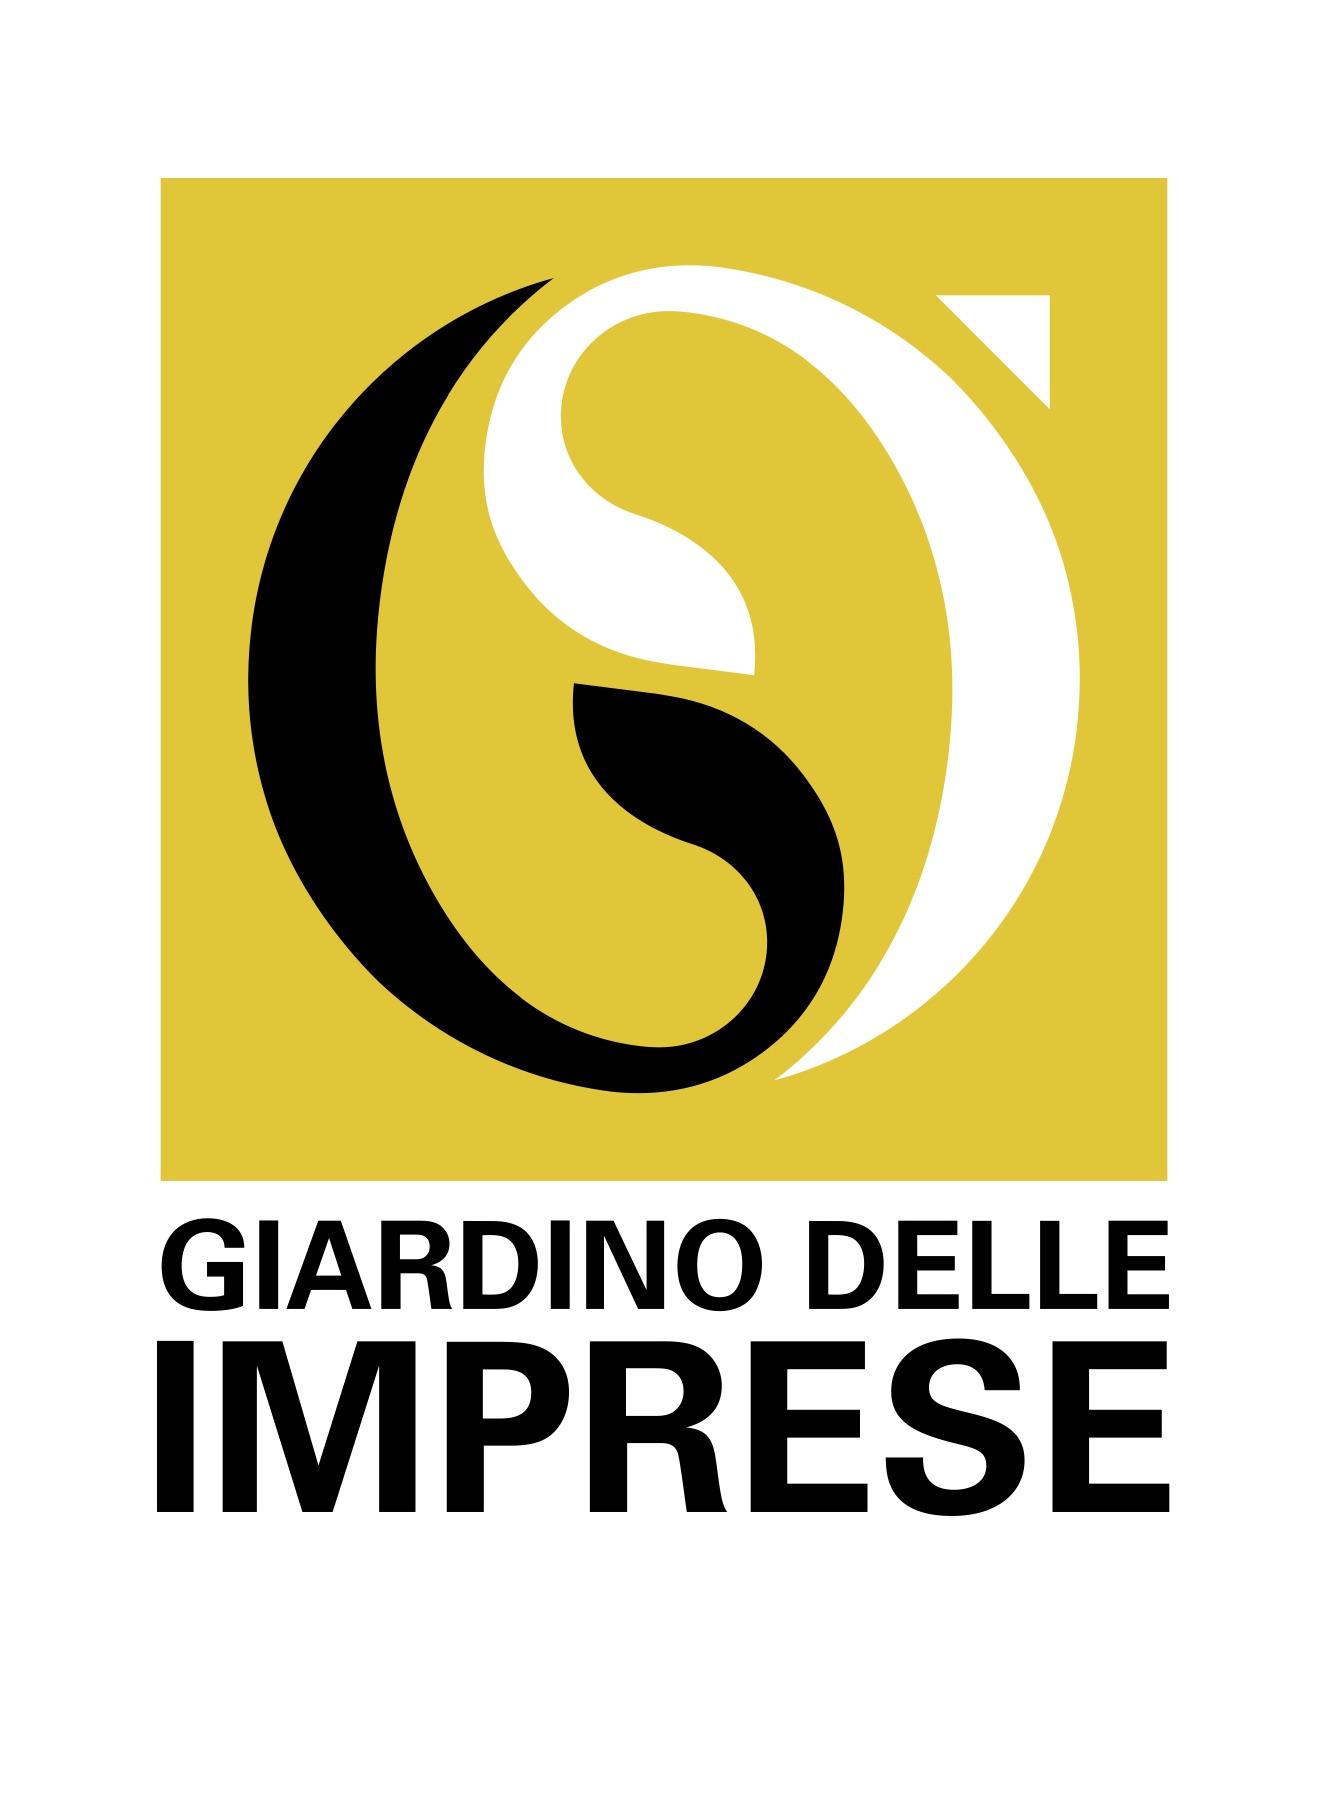 Logo_GIARDINO-DELLE-IMPRESE_PANTONE_110_C